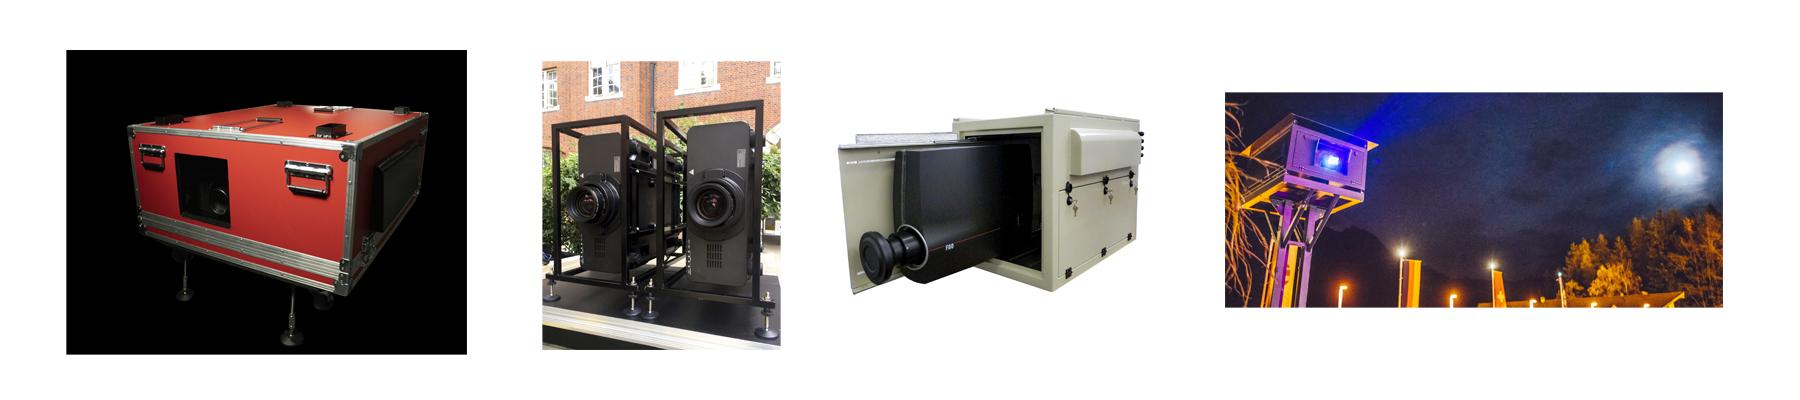 4 types of Outdoor Projector Enclosures